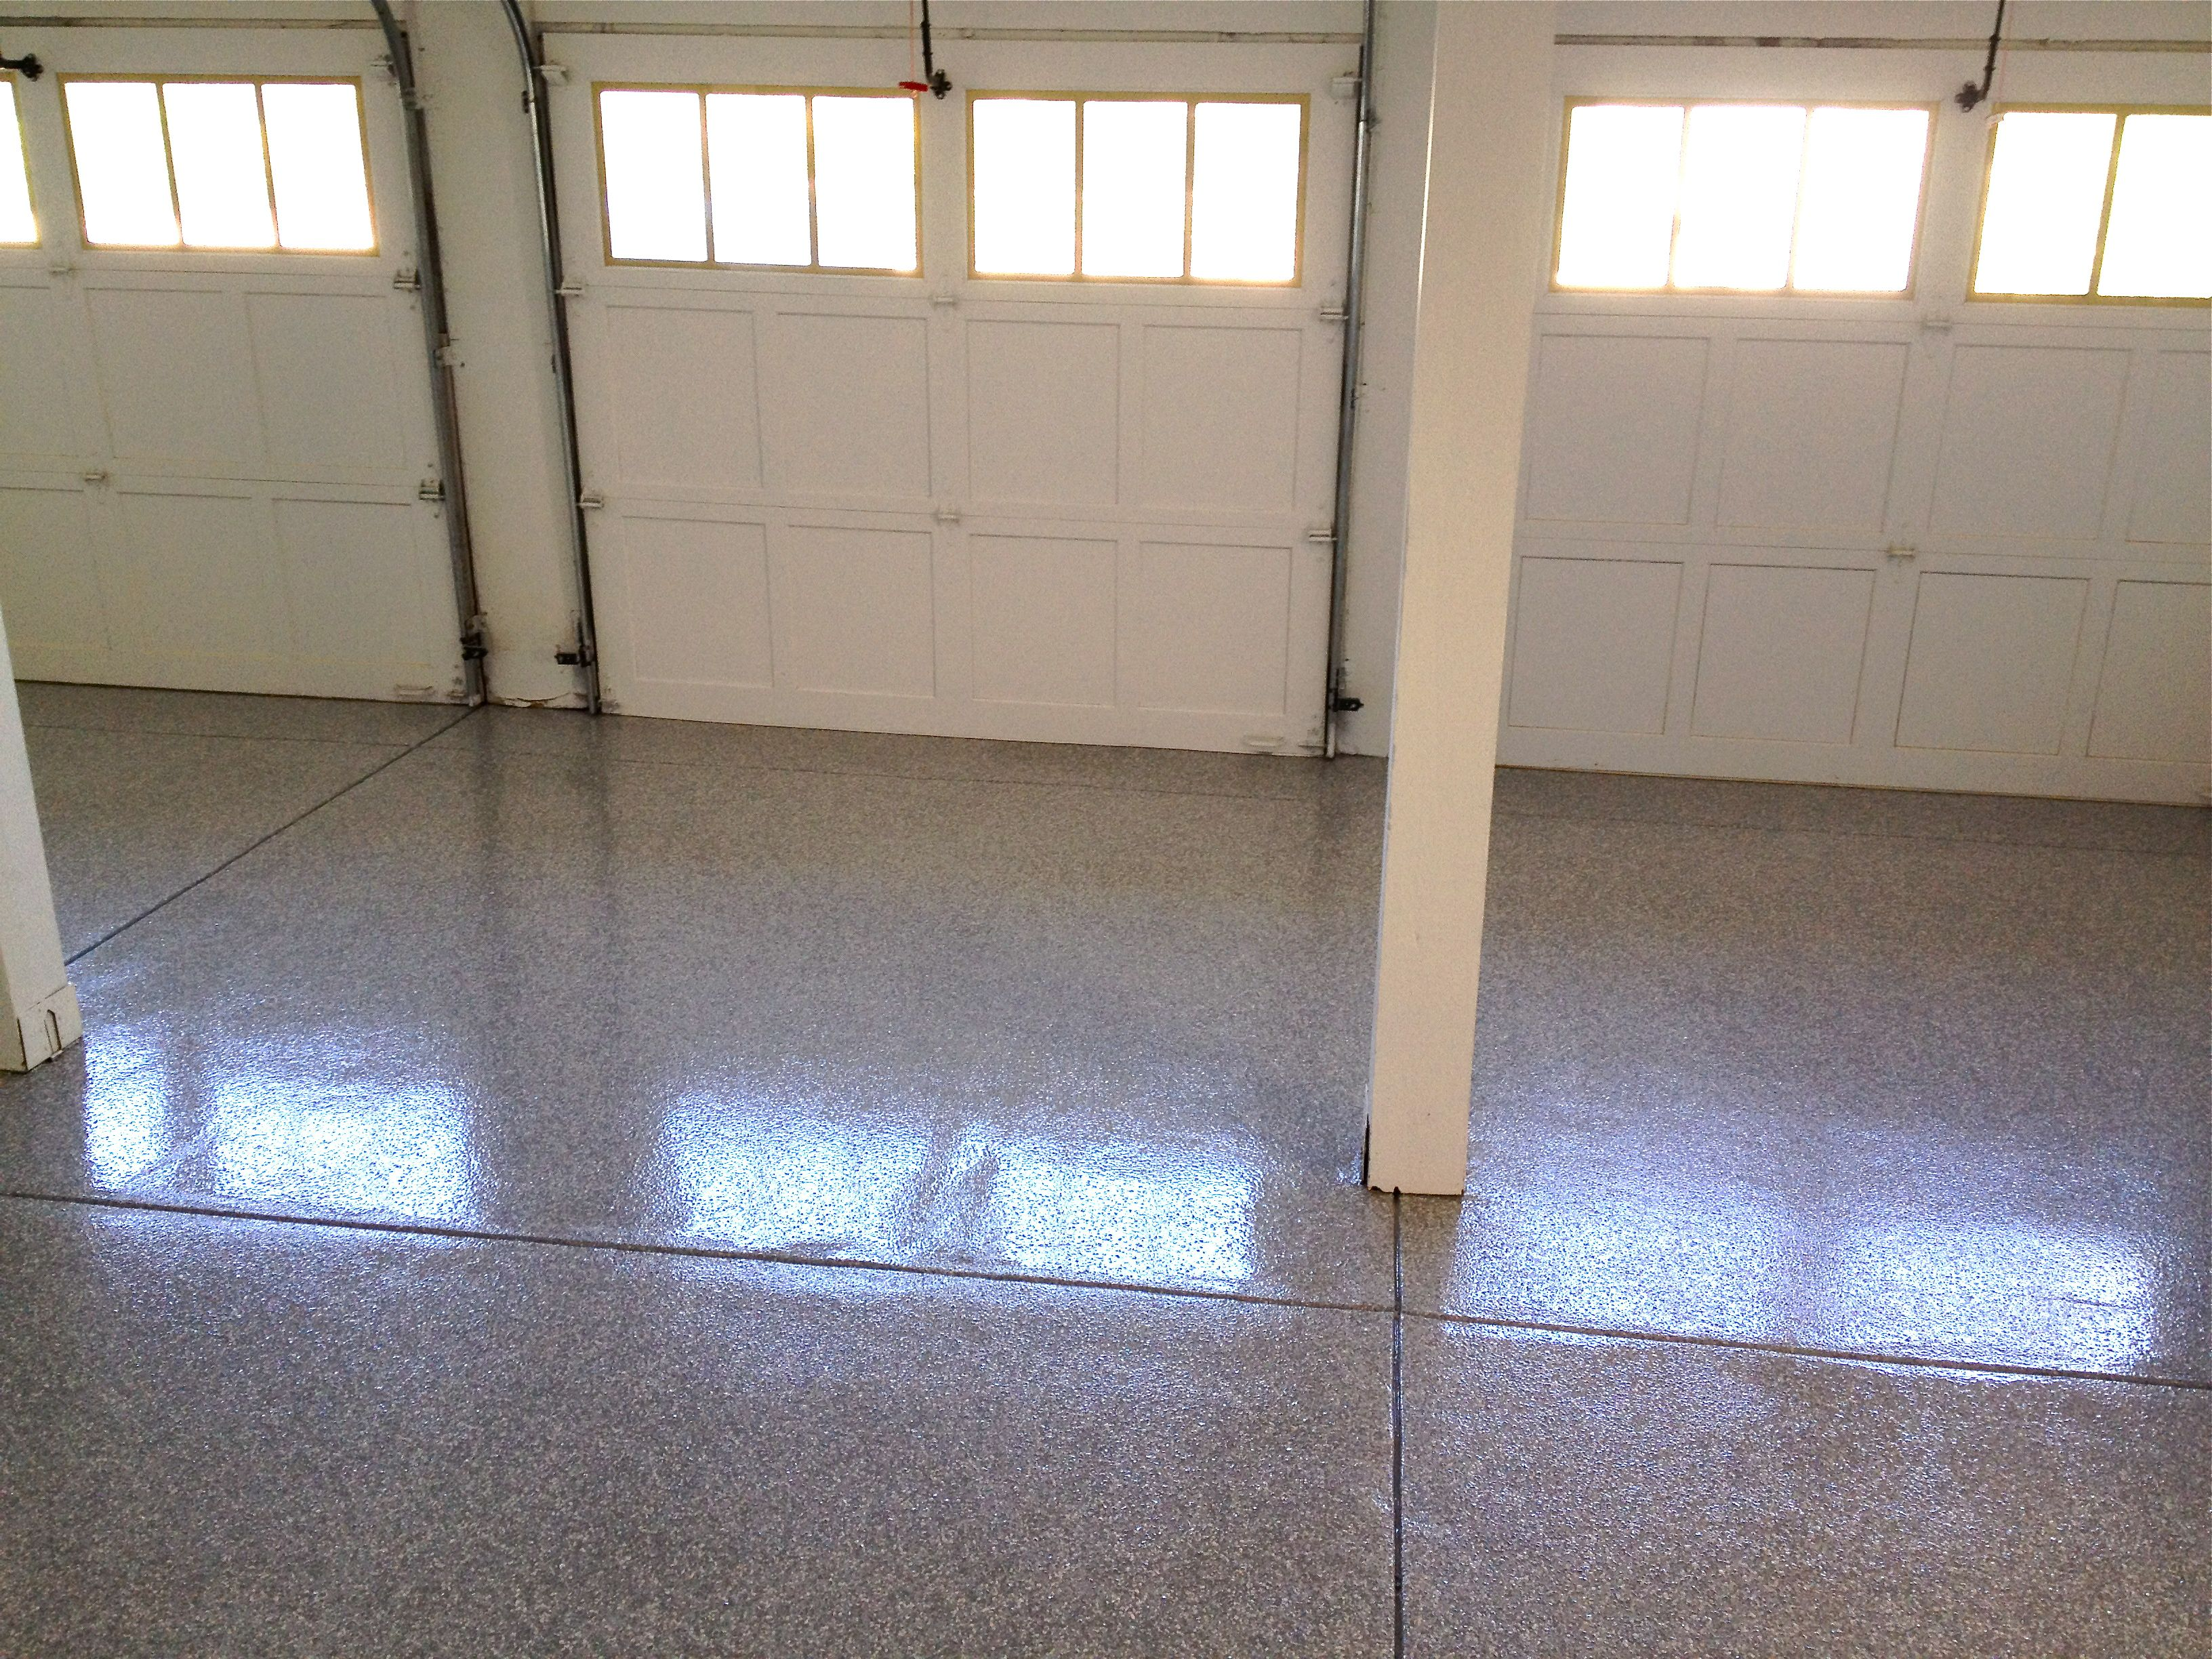 Garage Floor Epoxy Next Project Garage Floor Epoxy